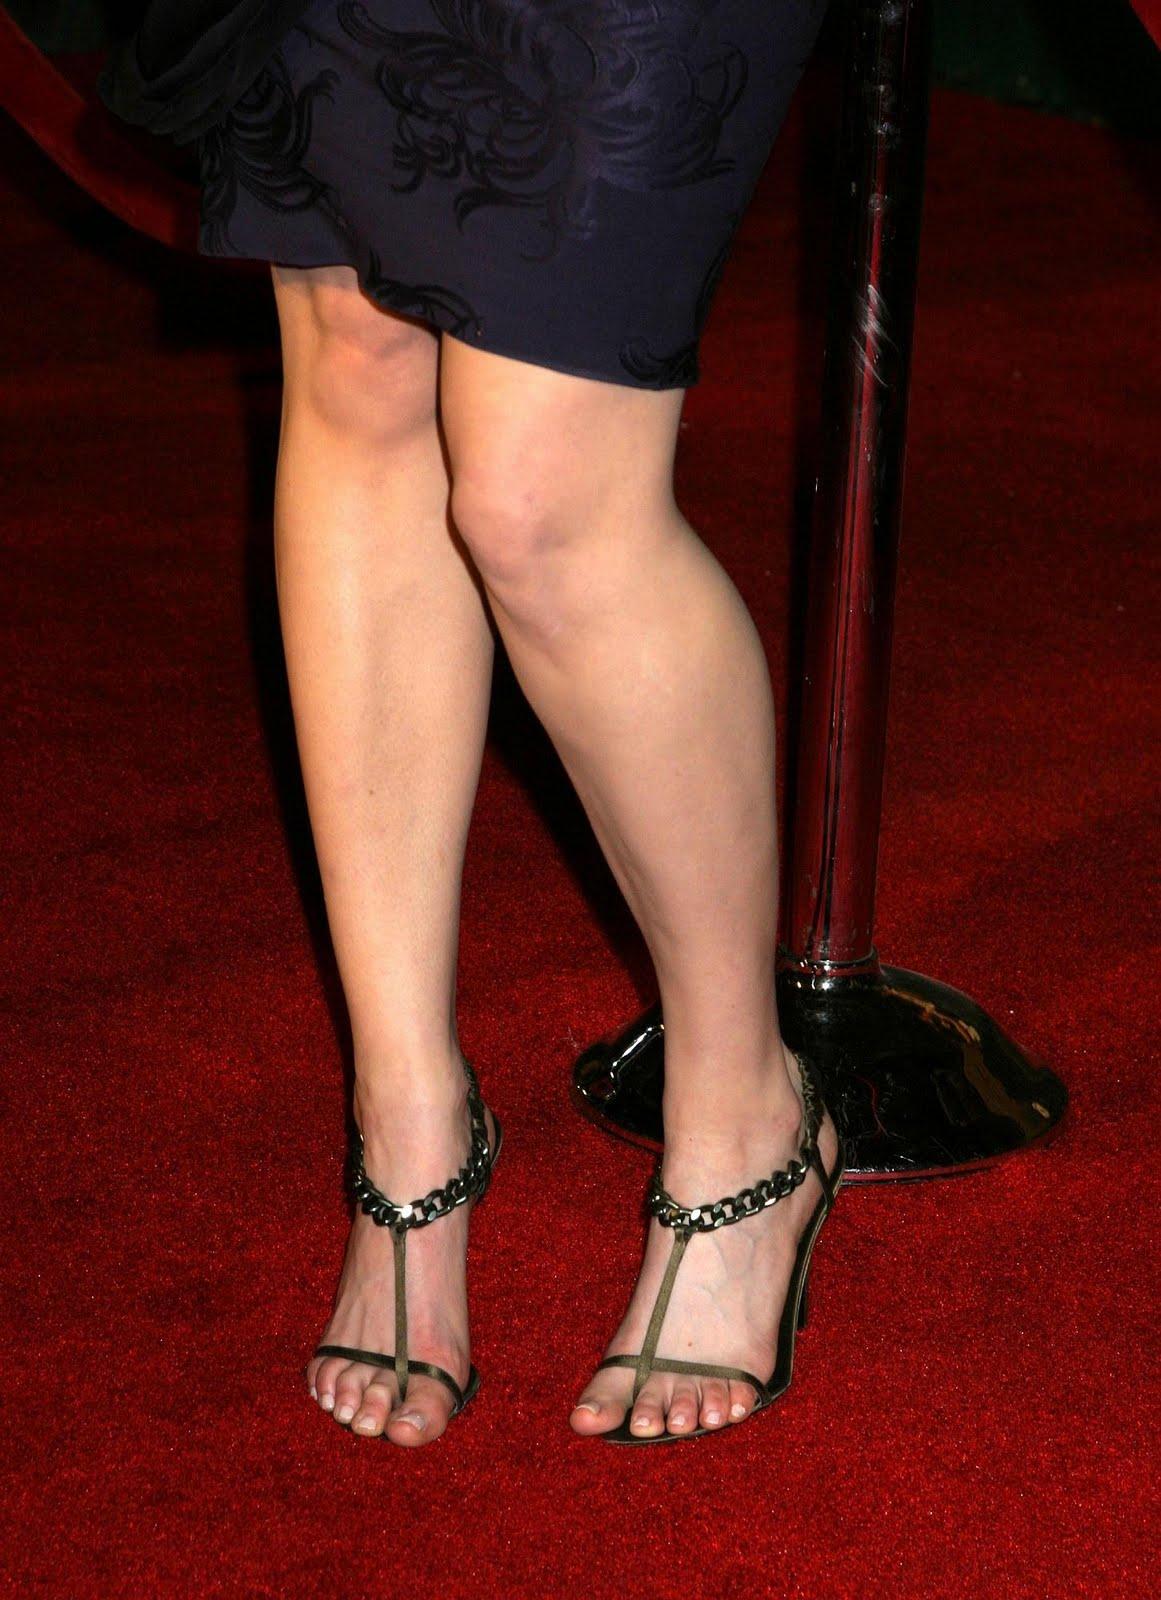 Emily deschanel naked feet have not